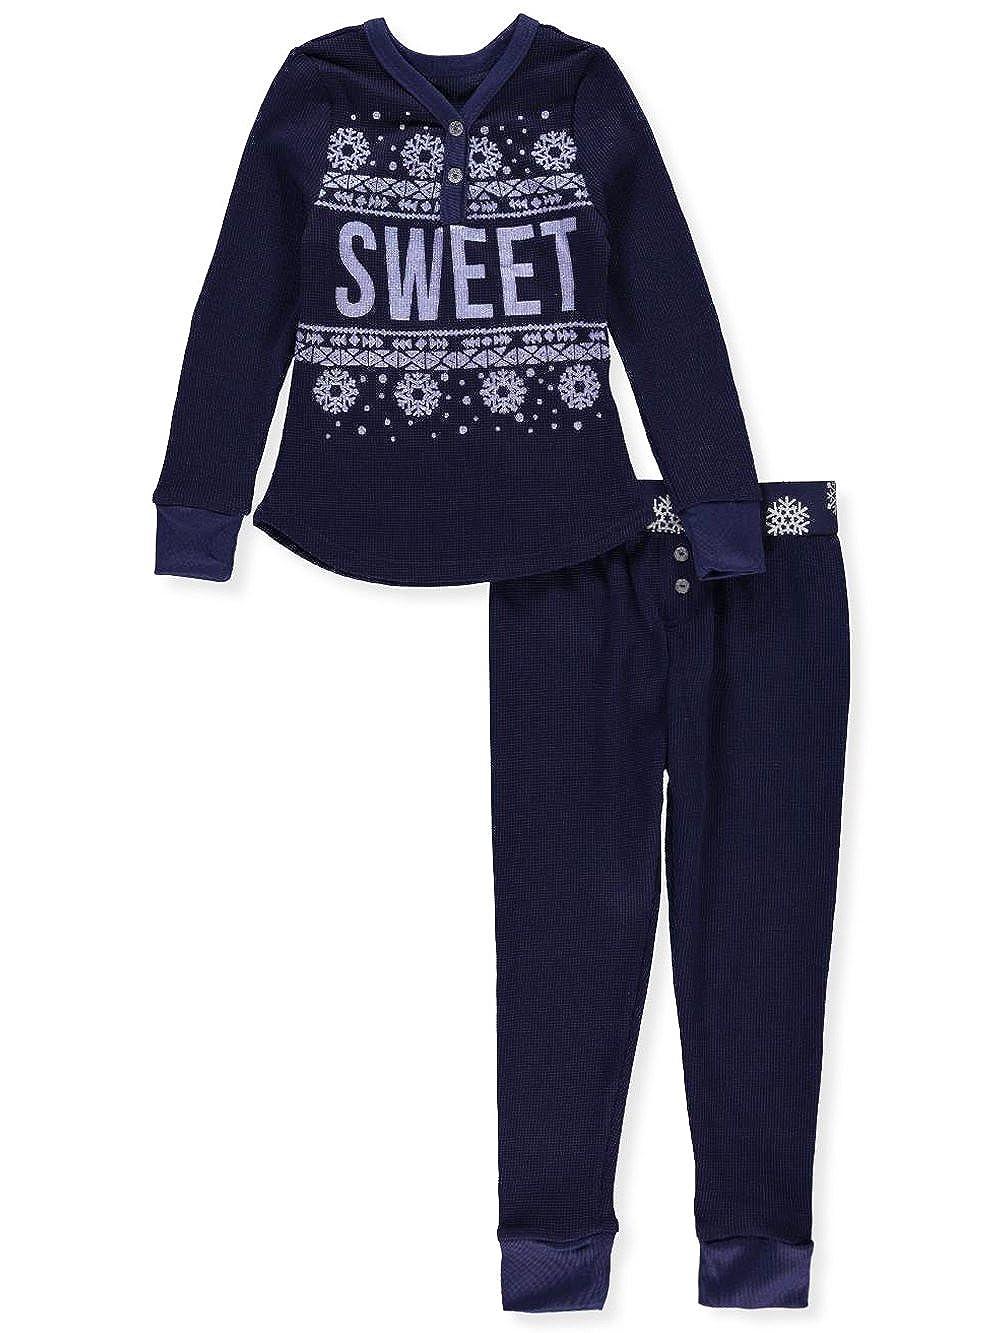 Delia's Girls' 2-Piece Pajamas Delia' s